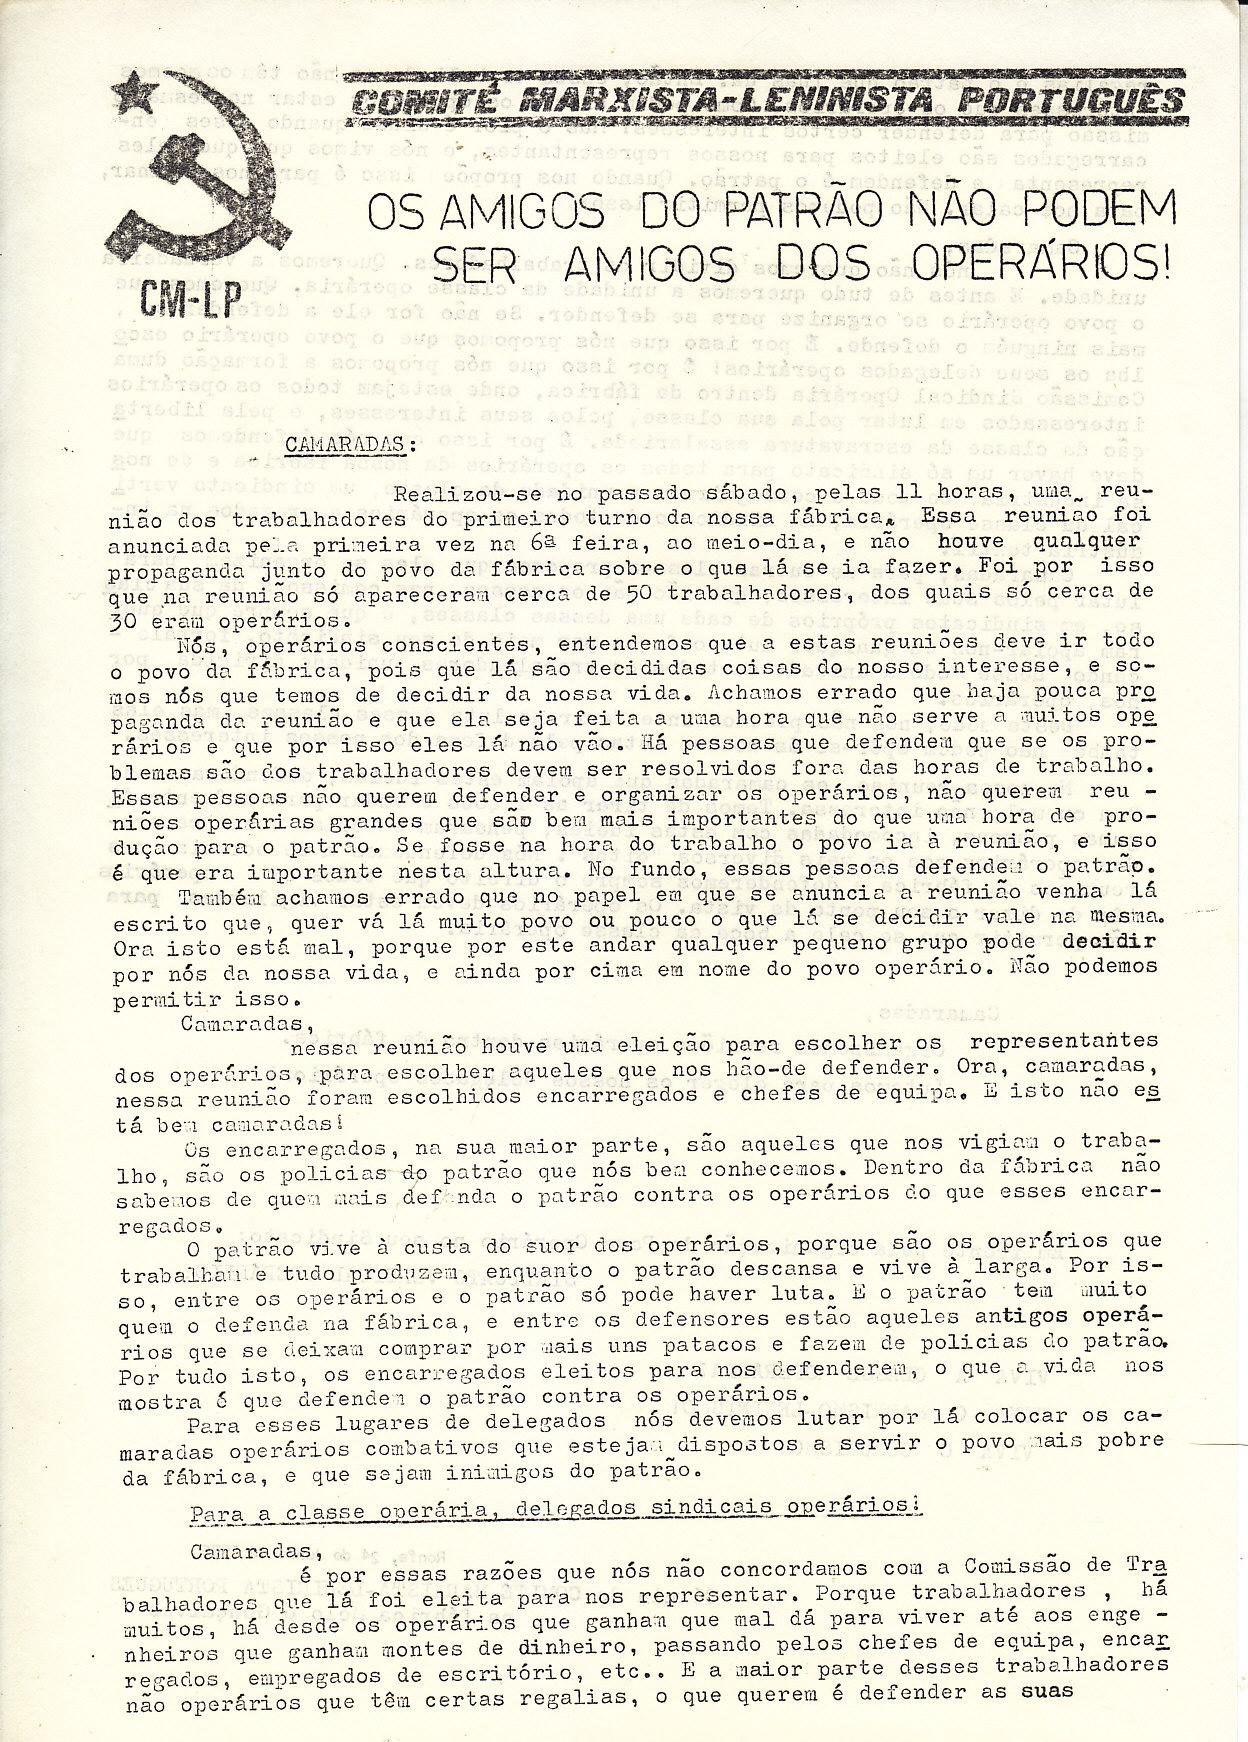 CMLP_Melo&Goncalves_24-6-1975_0001